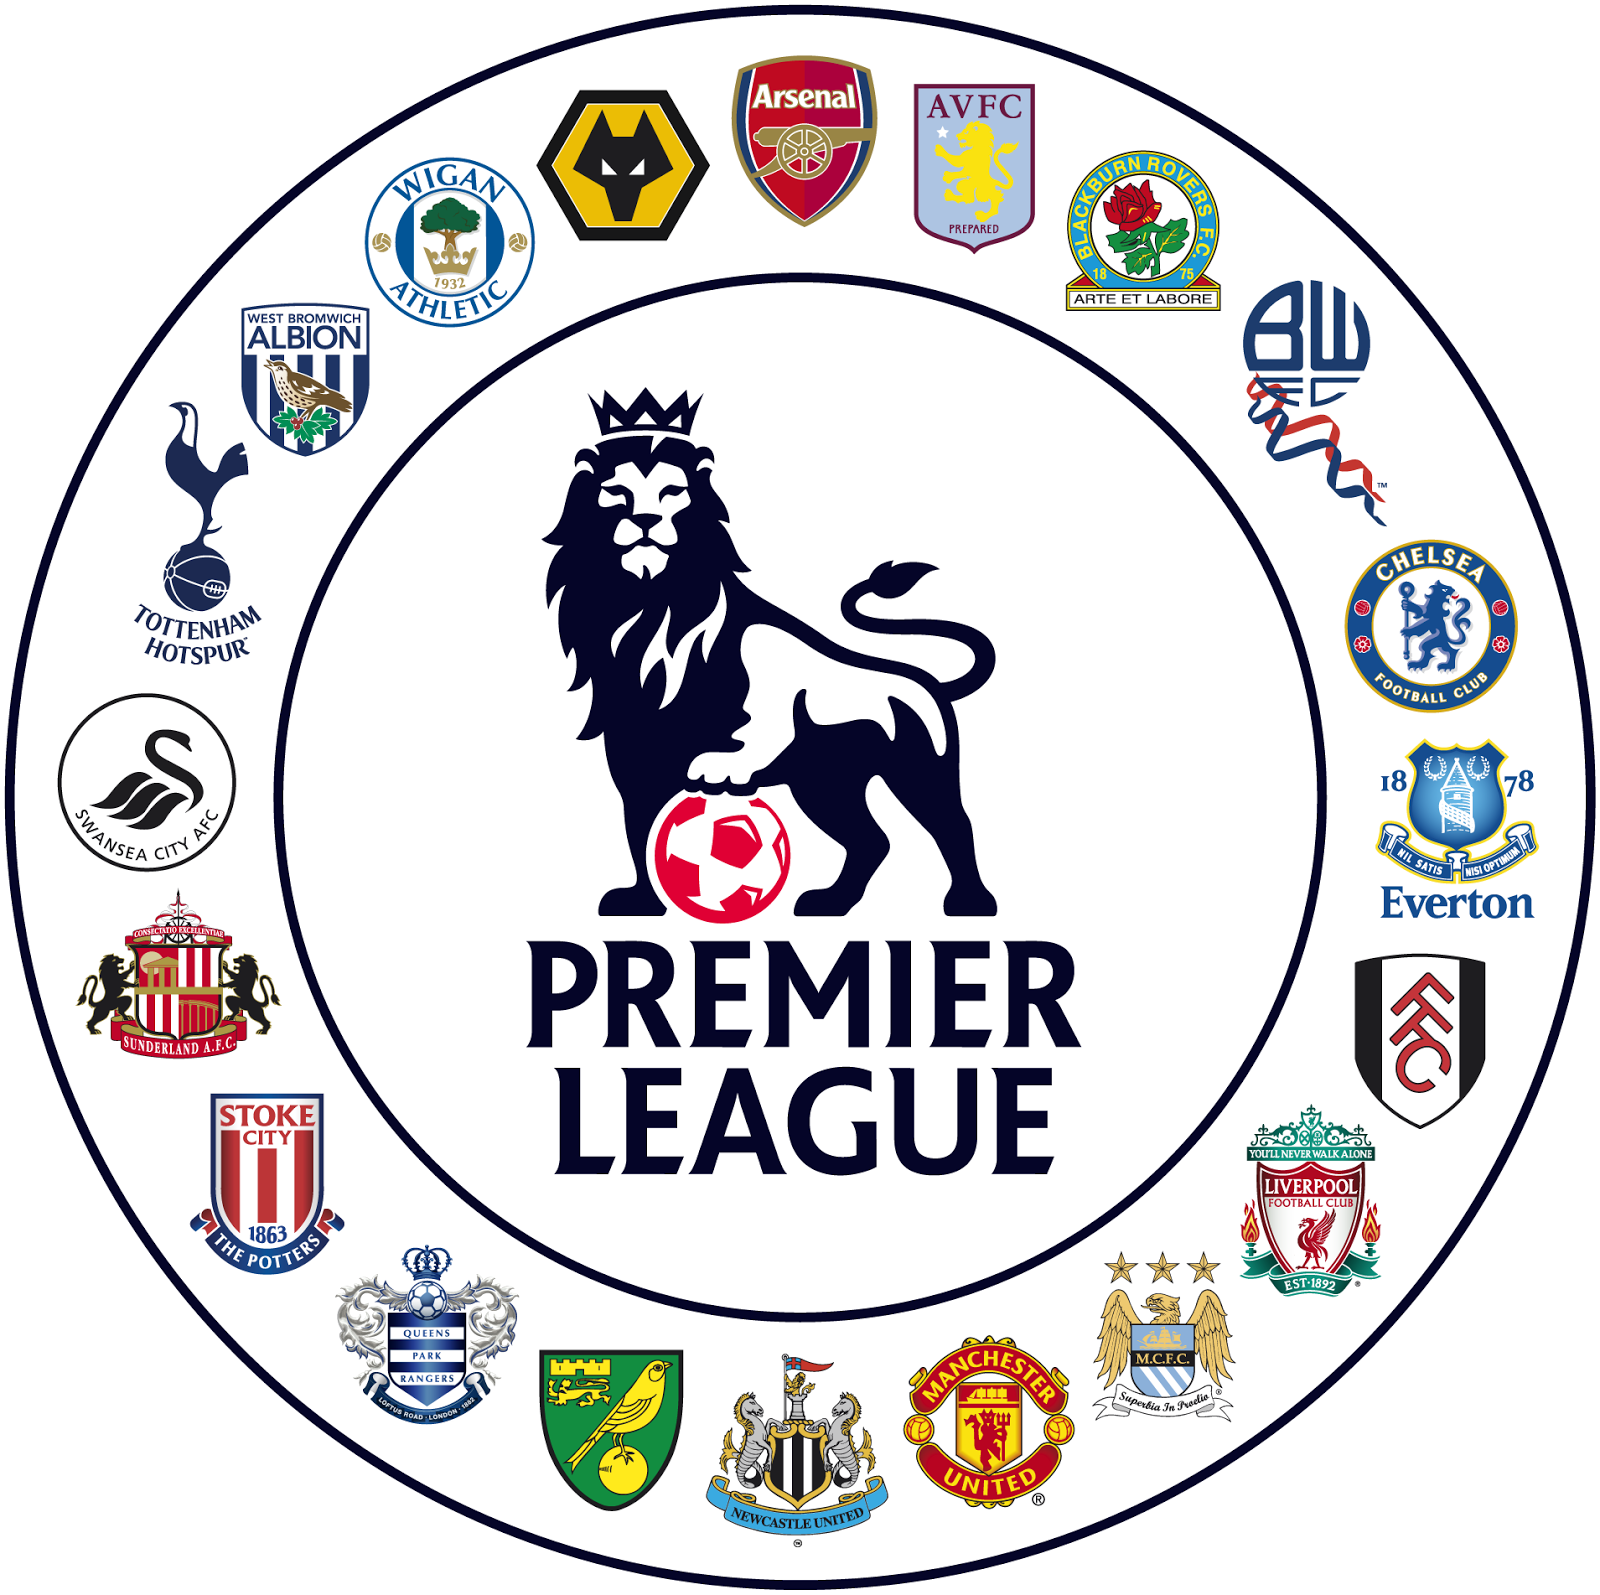 Barclays premier league 2013 2014 barclays premier league - Barclays premier league ranking table ...